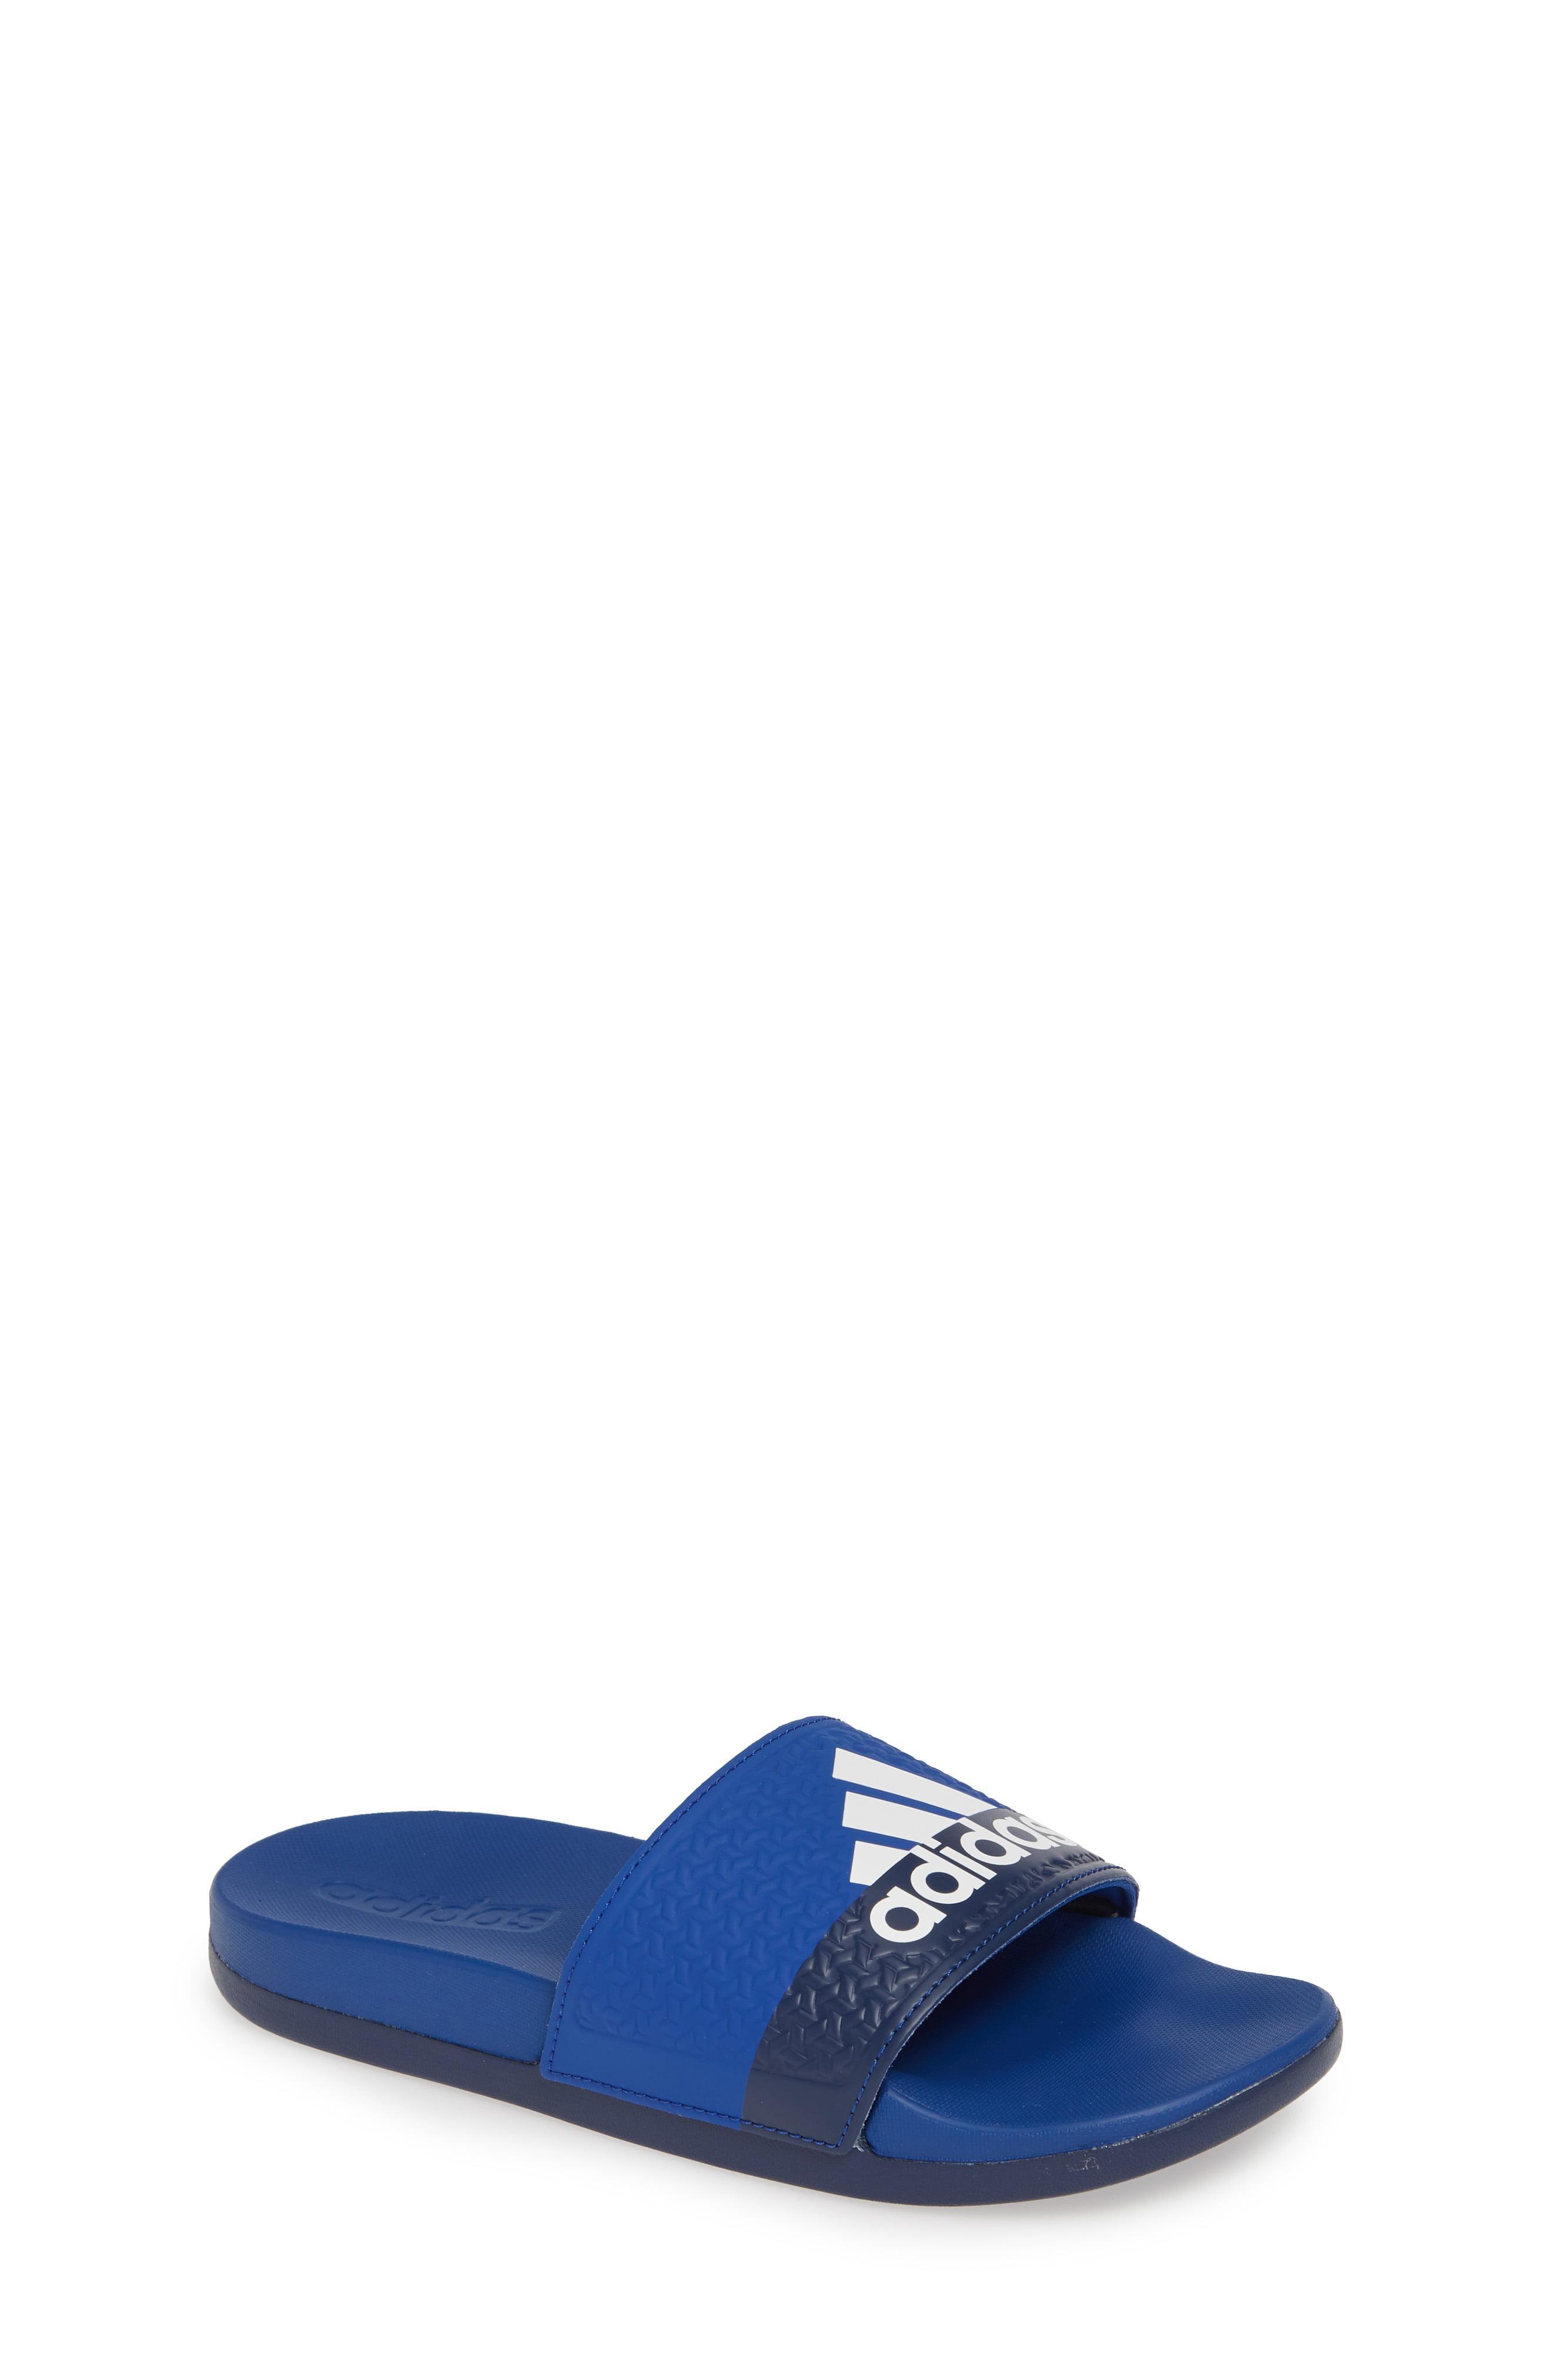 1a171cb6c Lyst - adidas Adilette Slide Sandal in Blue